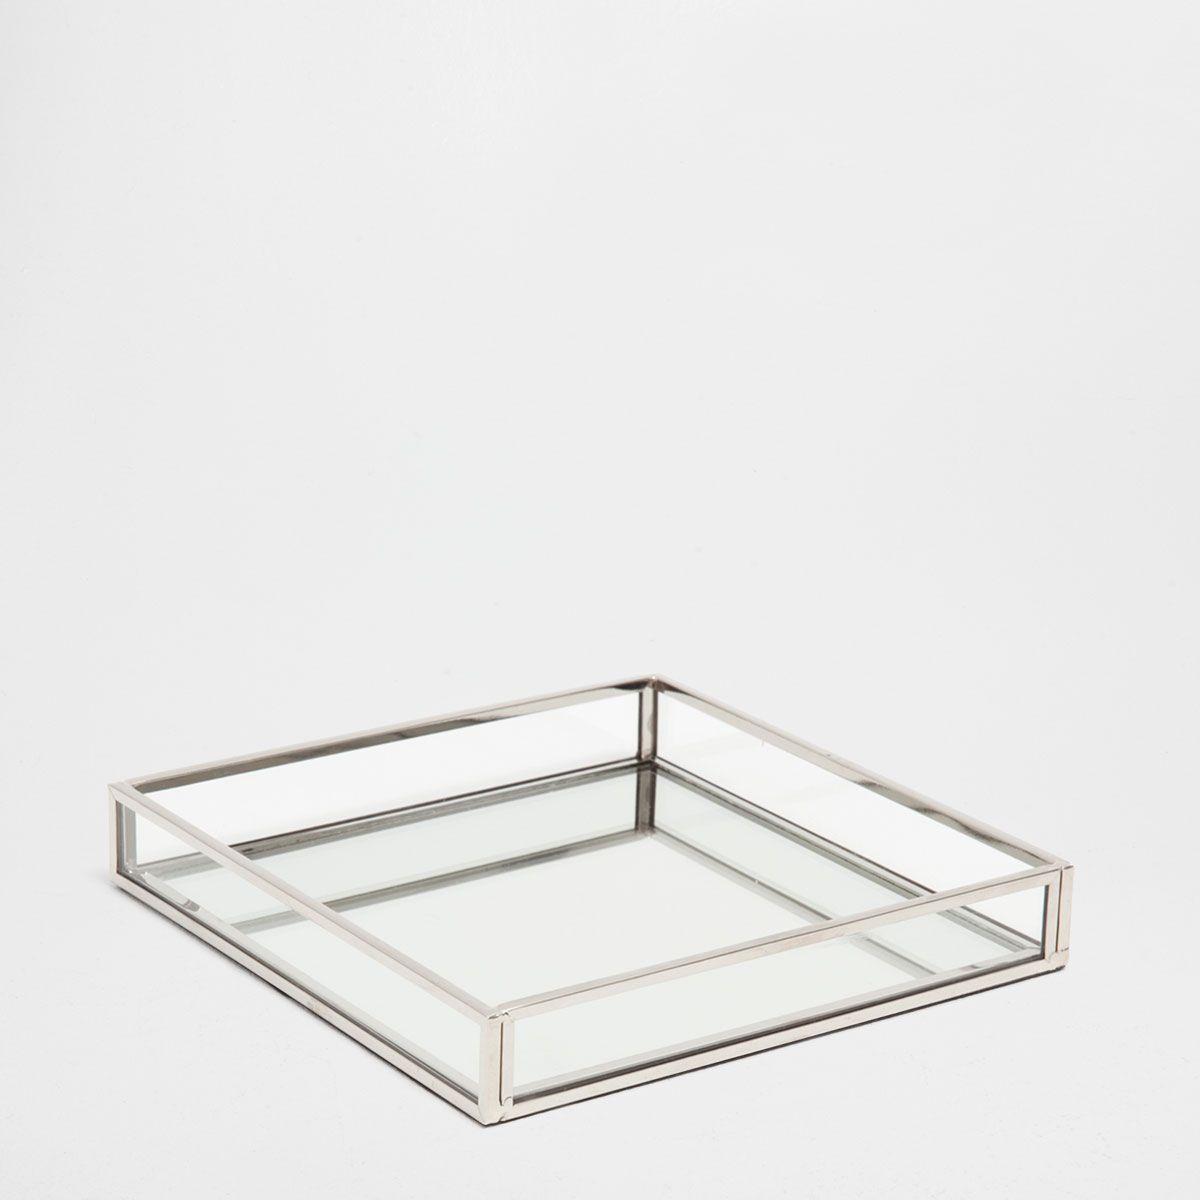 tray glass brass decor small decorative and trays